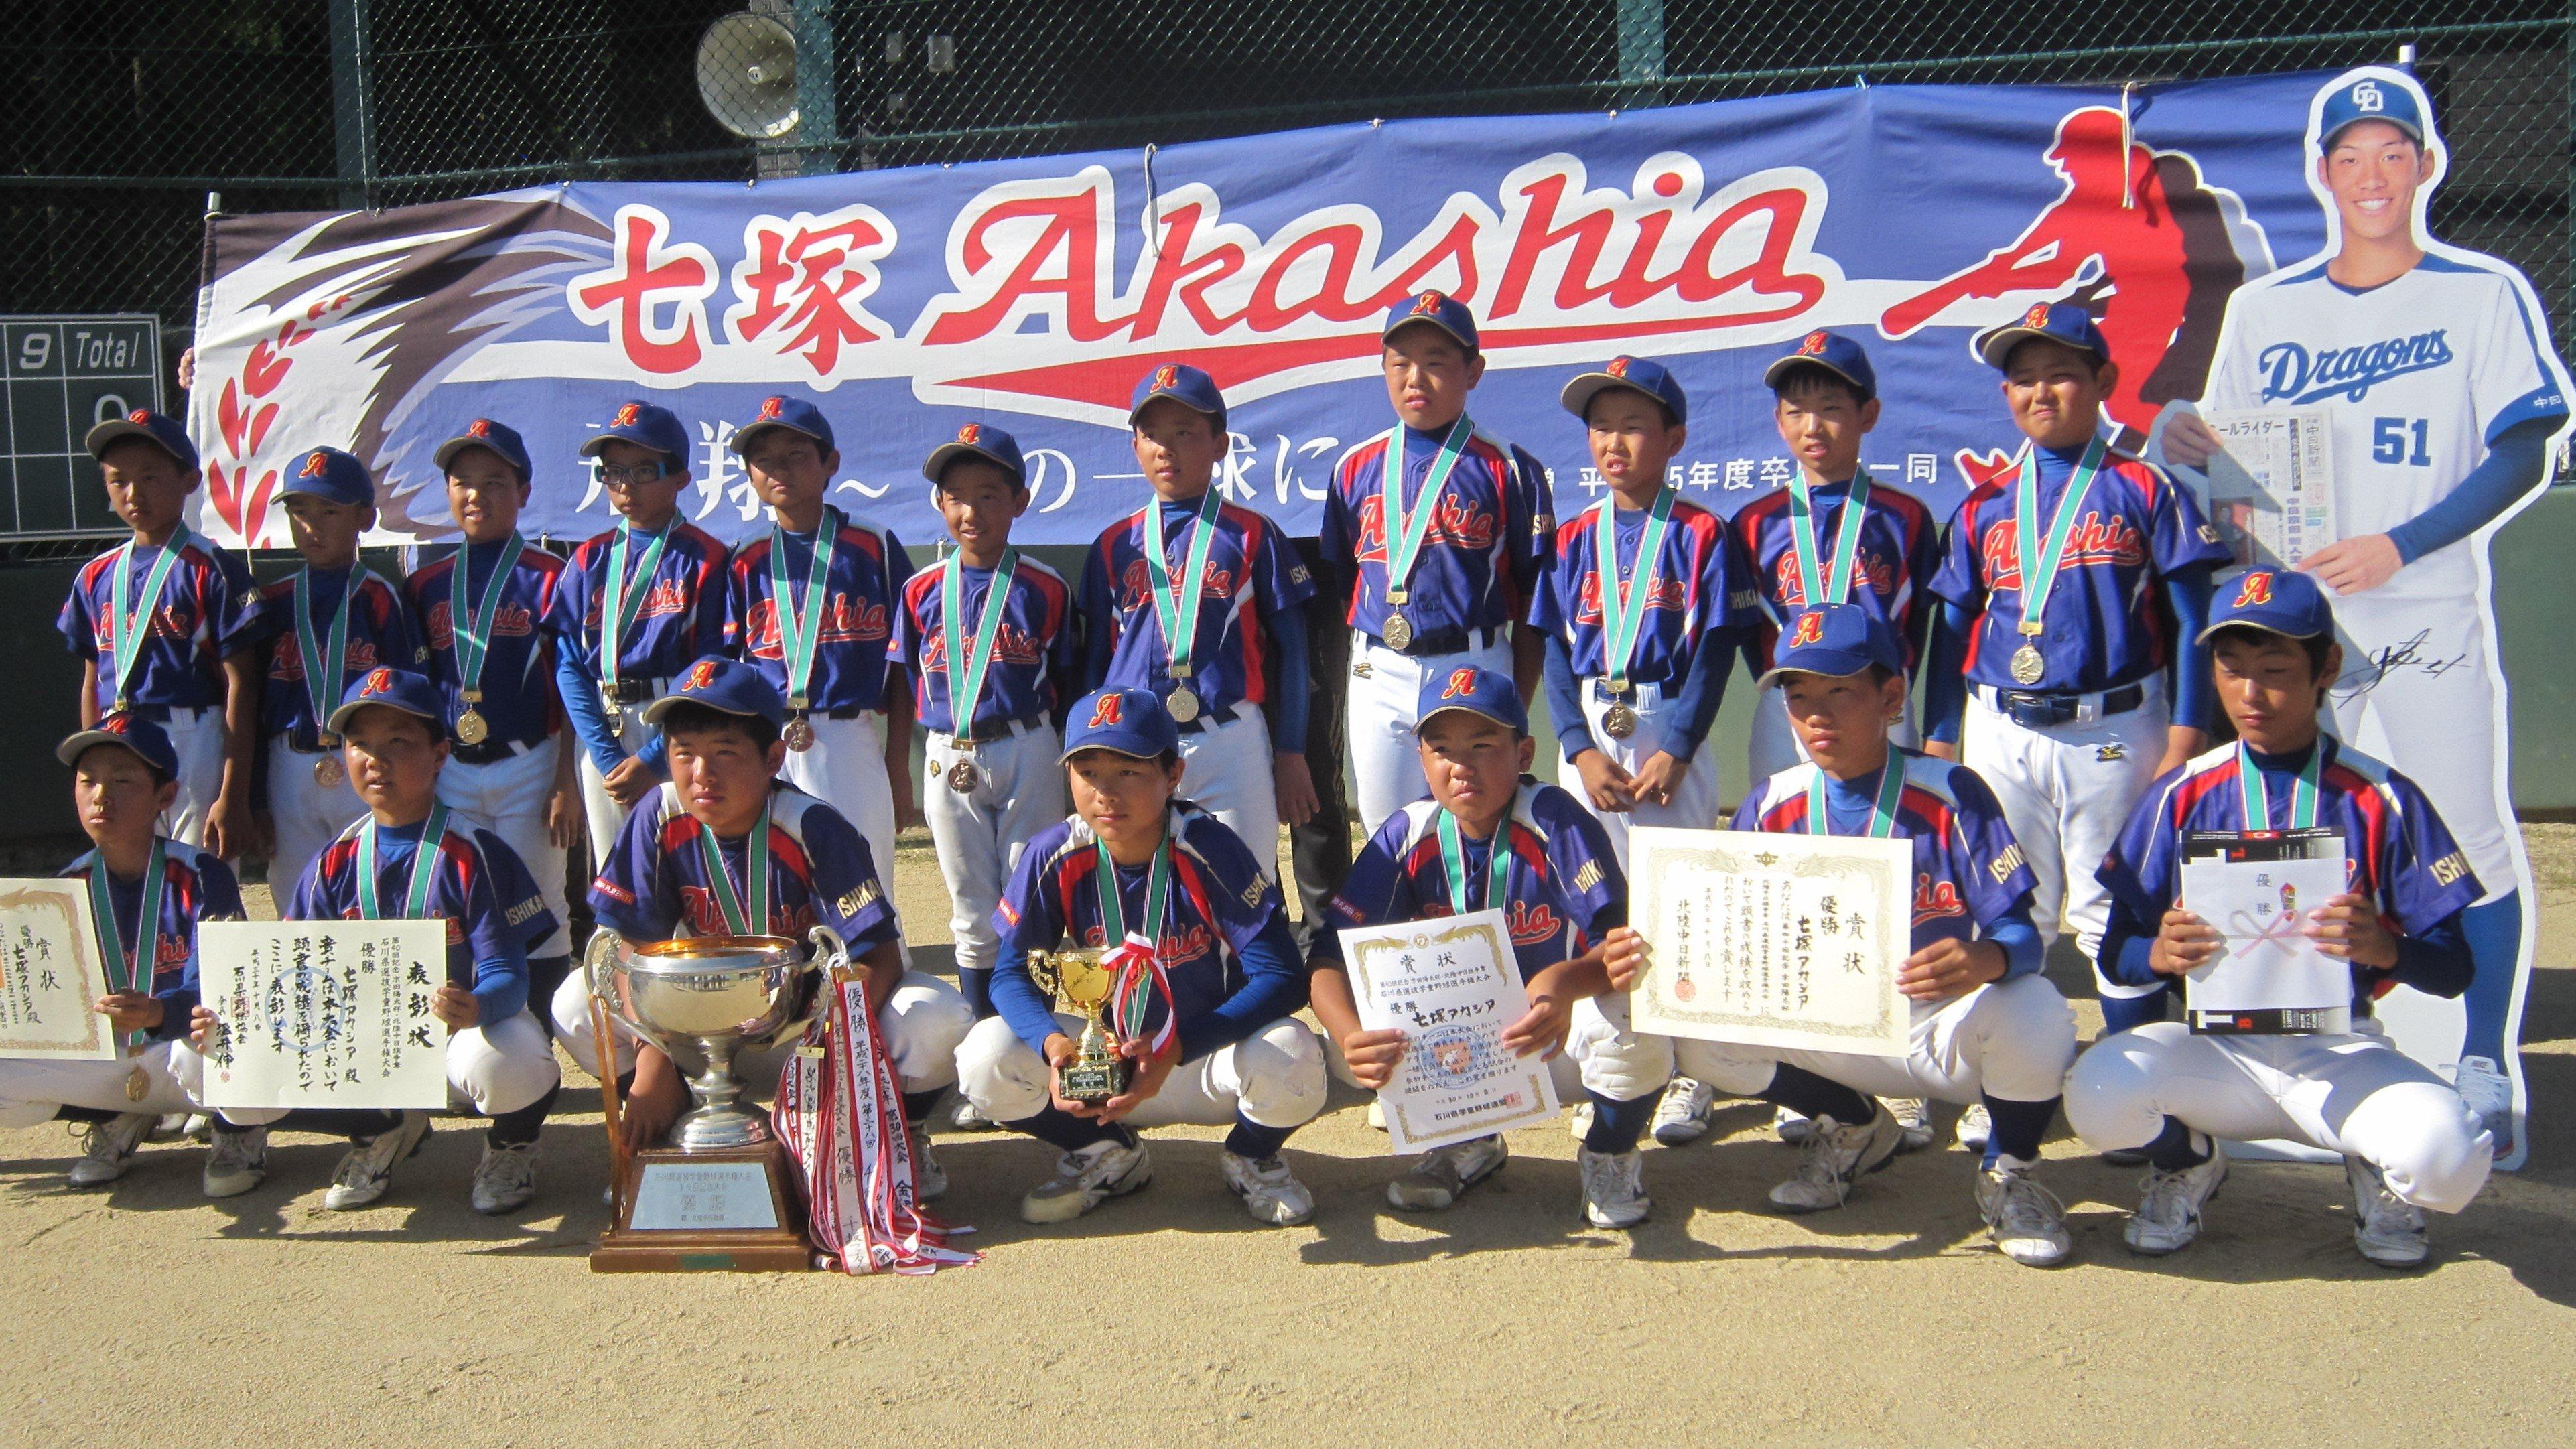 hoshieiPMPPM 写真301008 石川県選抜学童野球大会七塚アカシア優勝チーム優勝集合写真